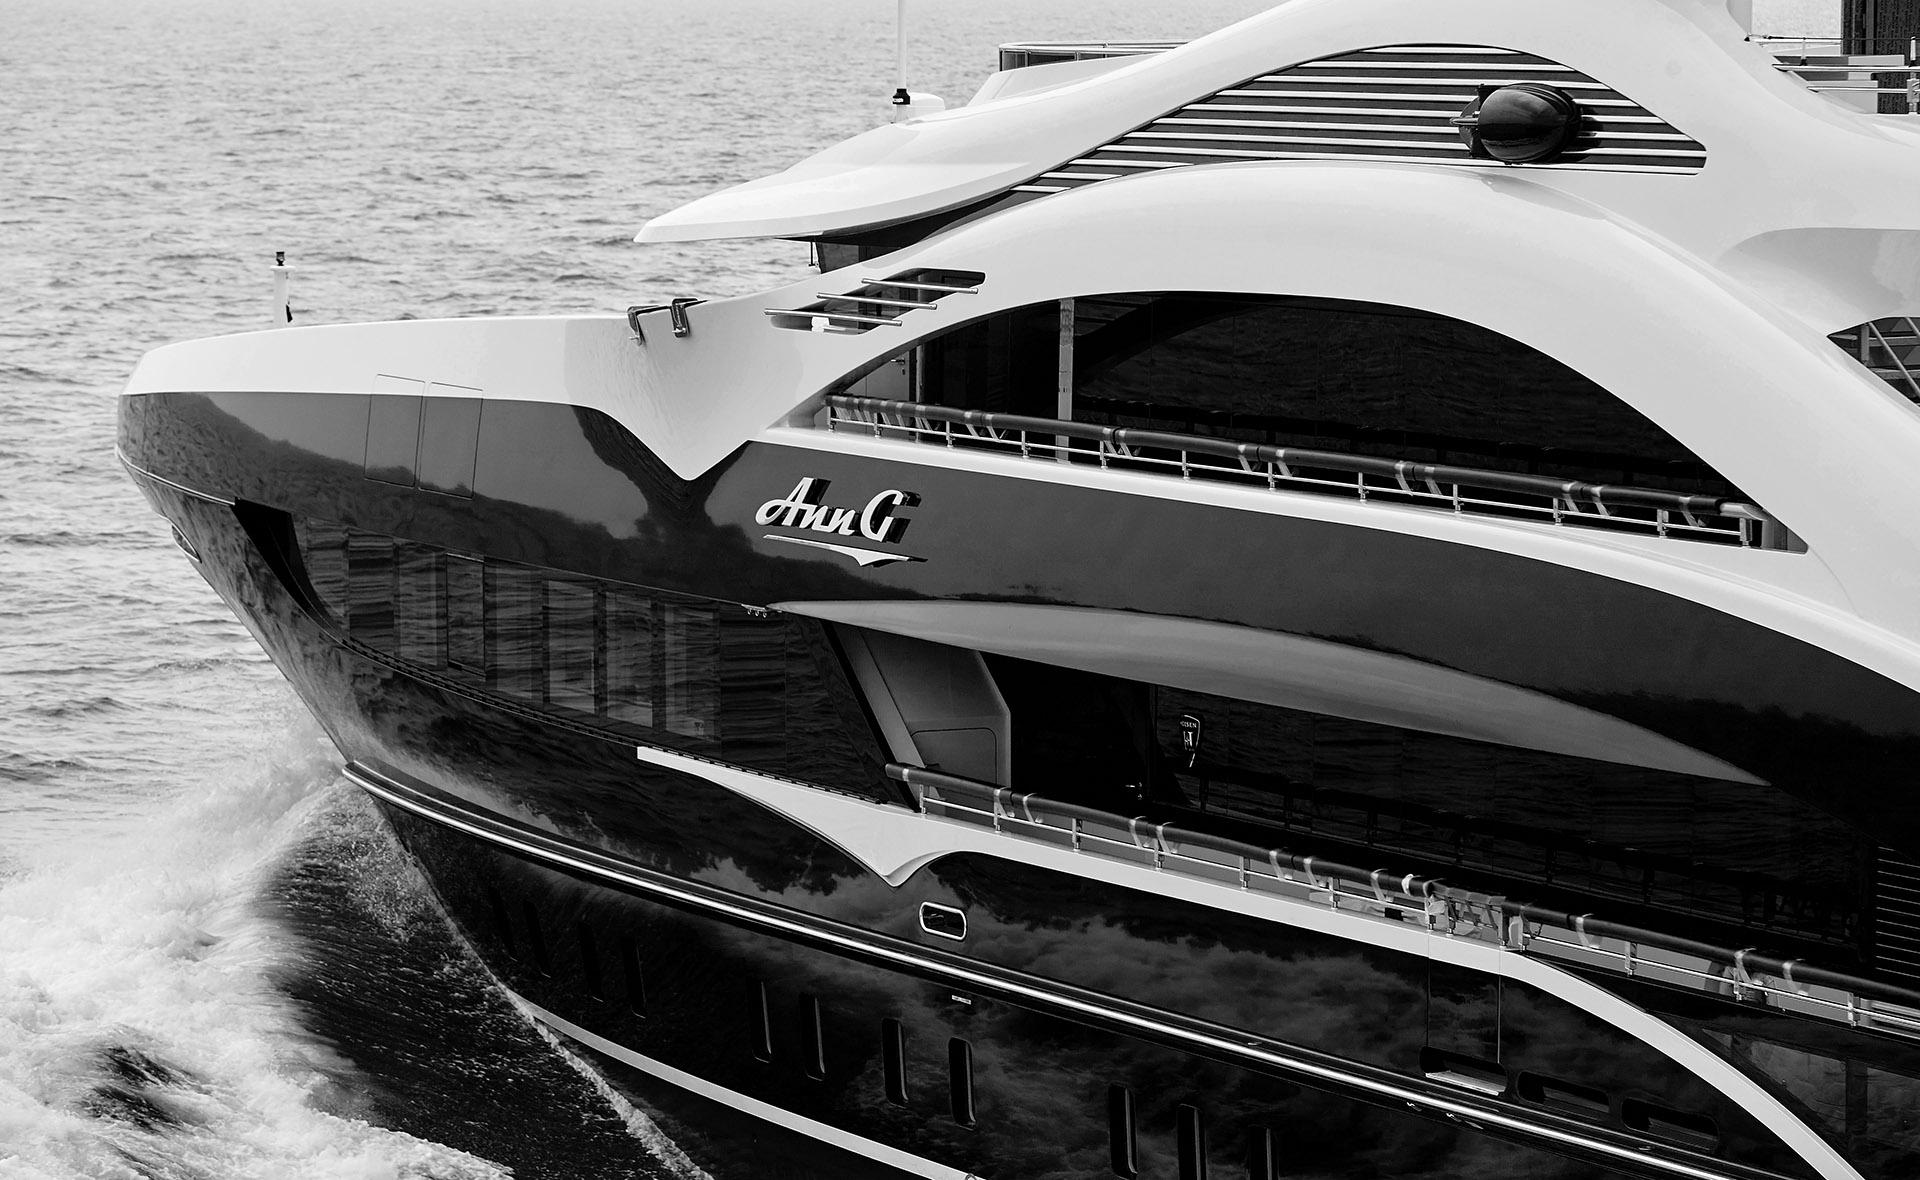 Heesen yachts HY17350 Ann G